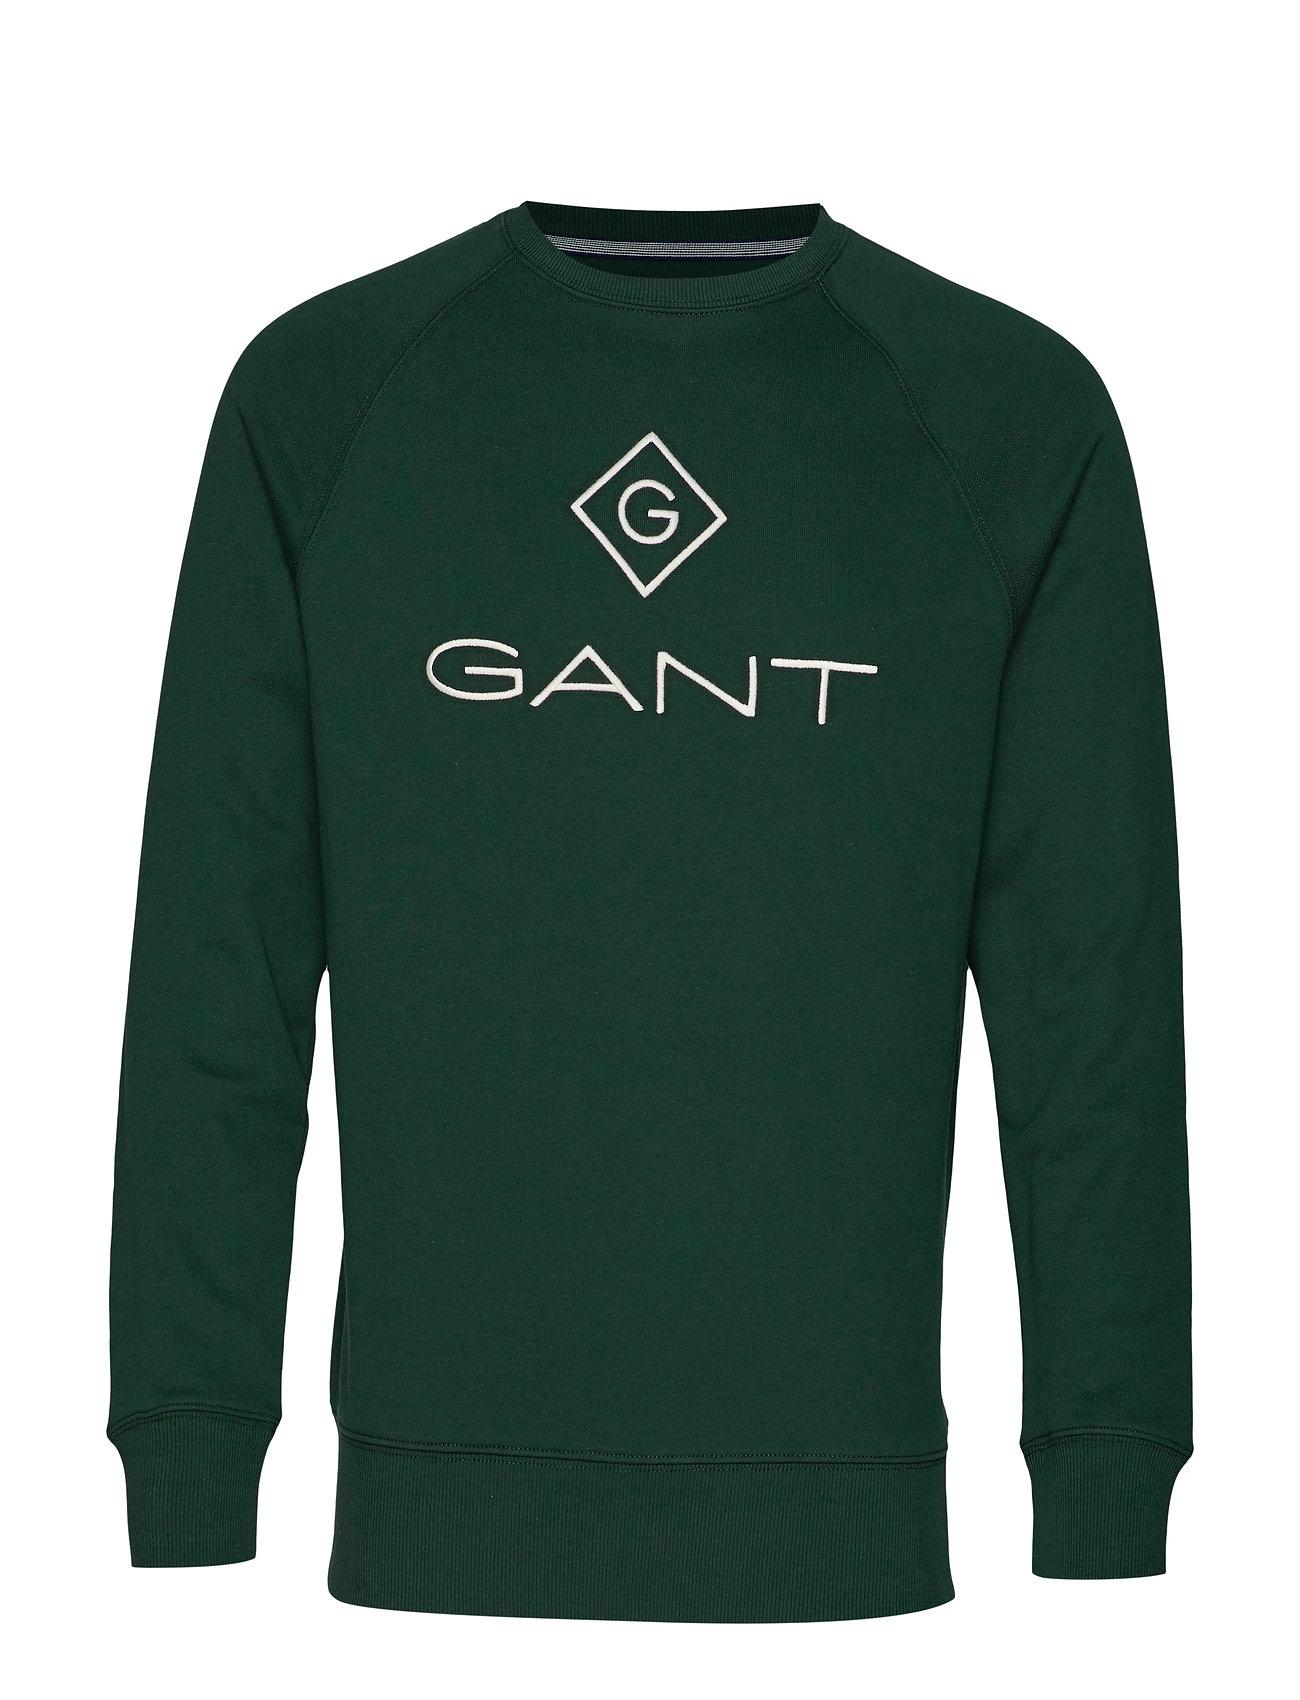 GANT LOCK UP C - NECK SWEAT - TARTAN GREEN